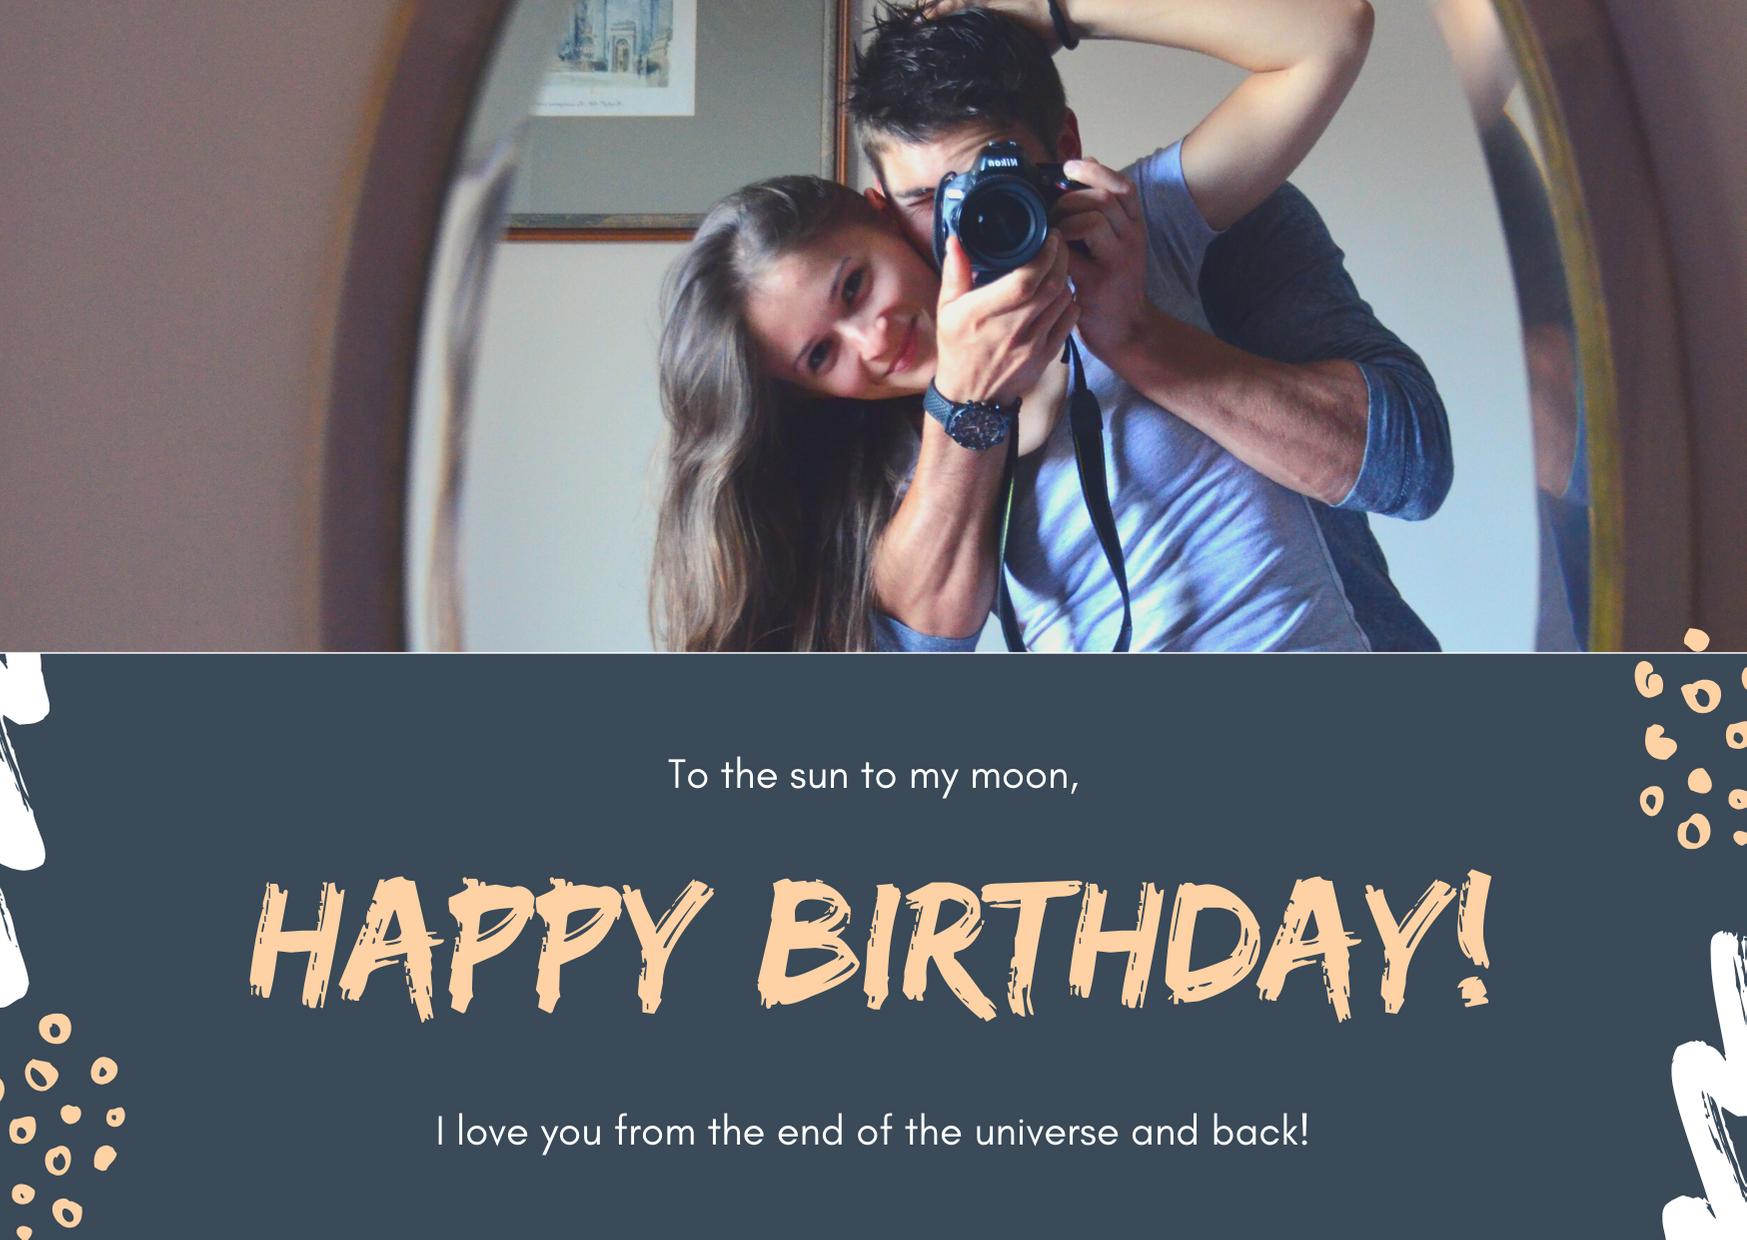 I will design 5 awesome birthday photos